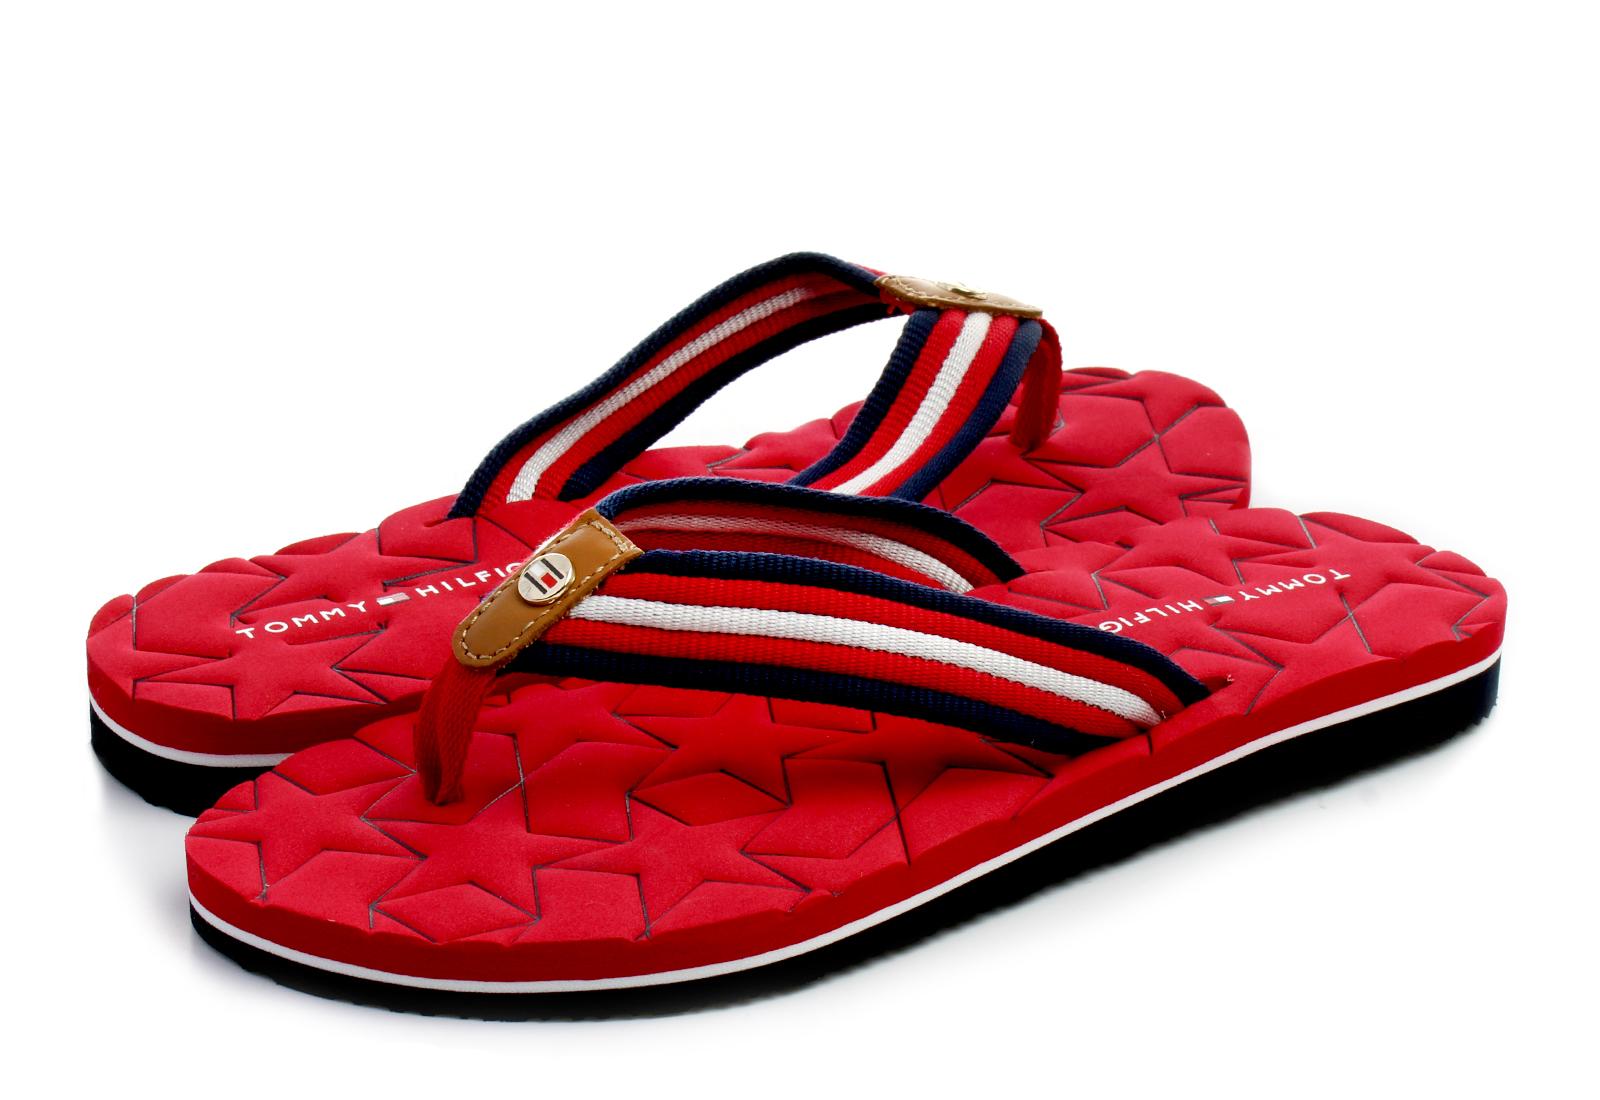 Tommy Hilfiger Papucs - Mellie 12 - 18S-2368-611 - Office Shoes ... 94226fd0b2